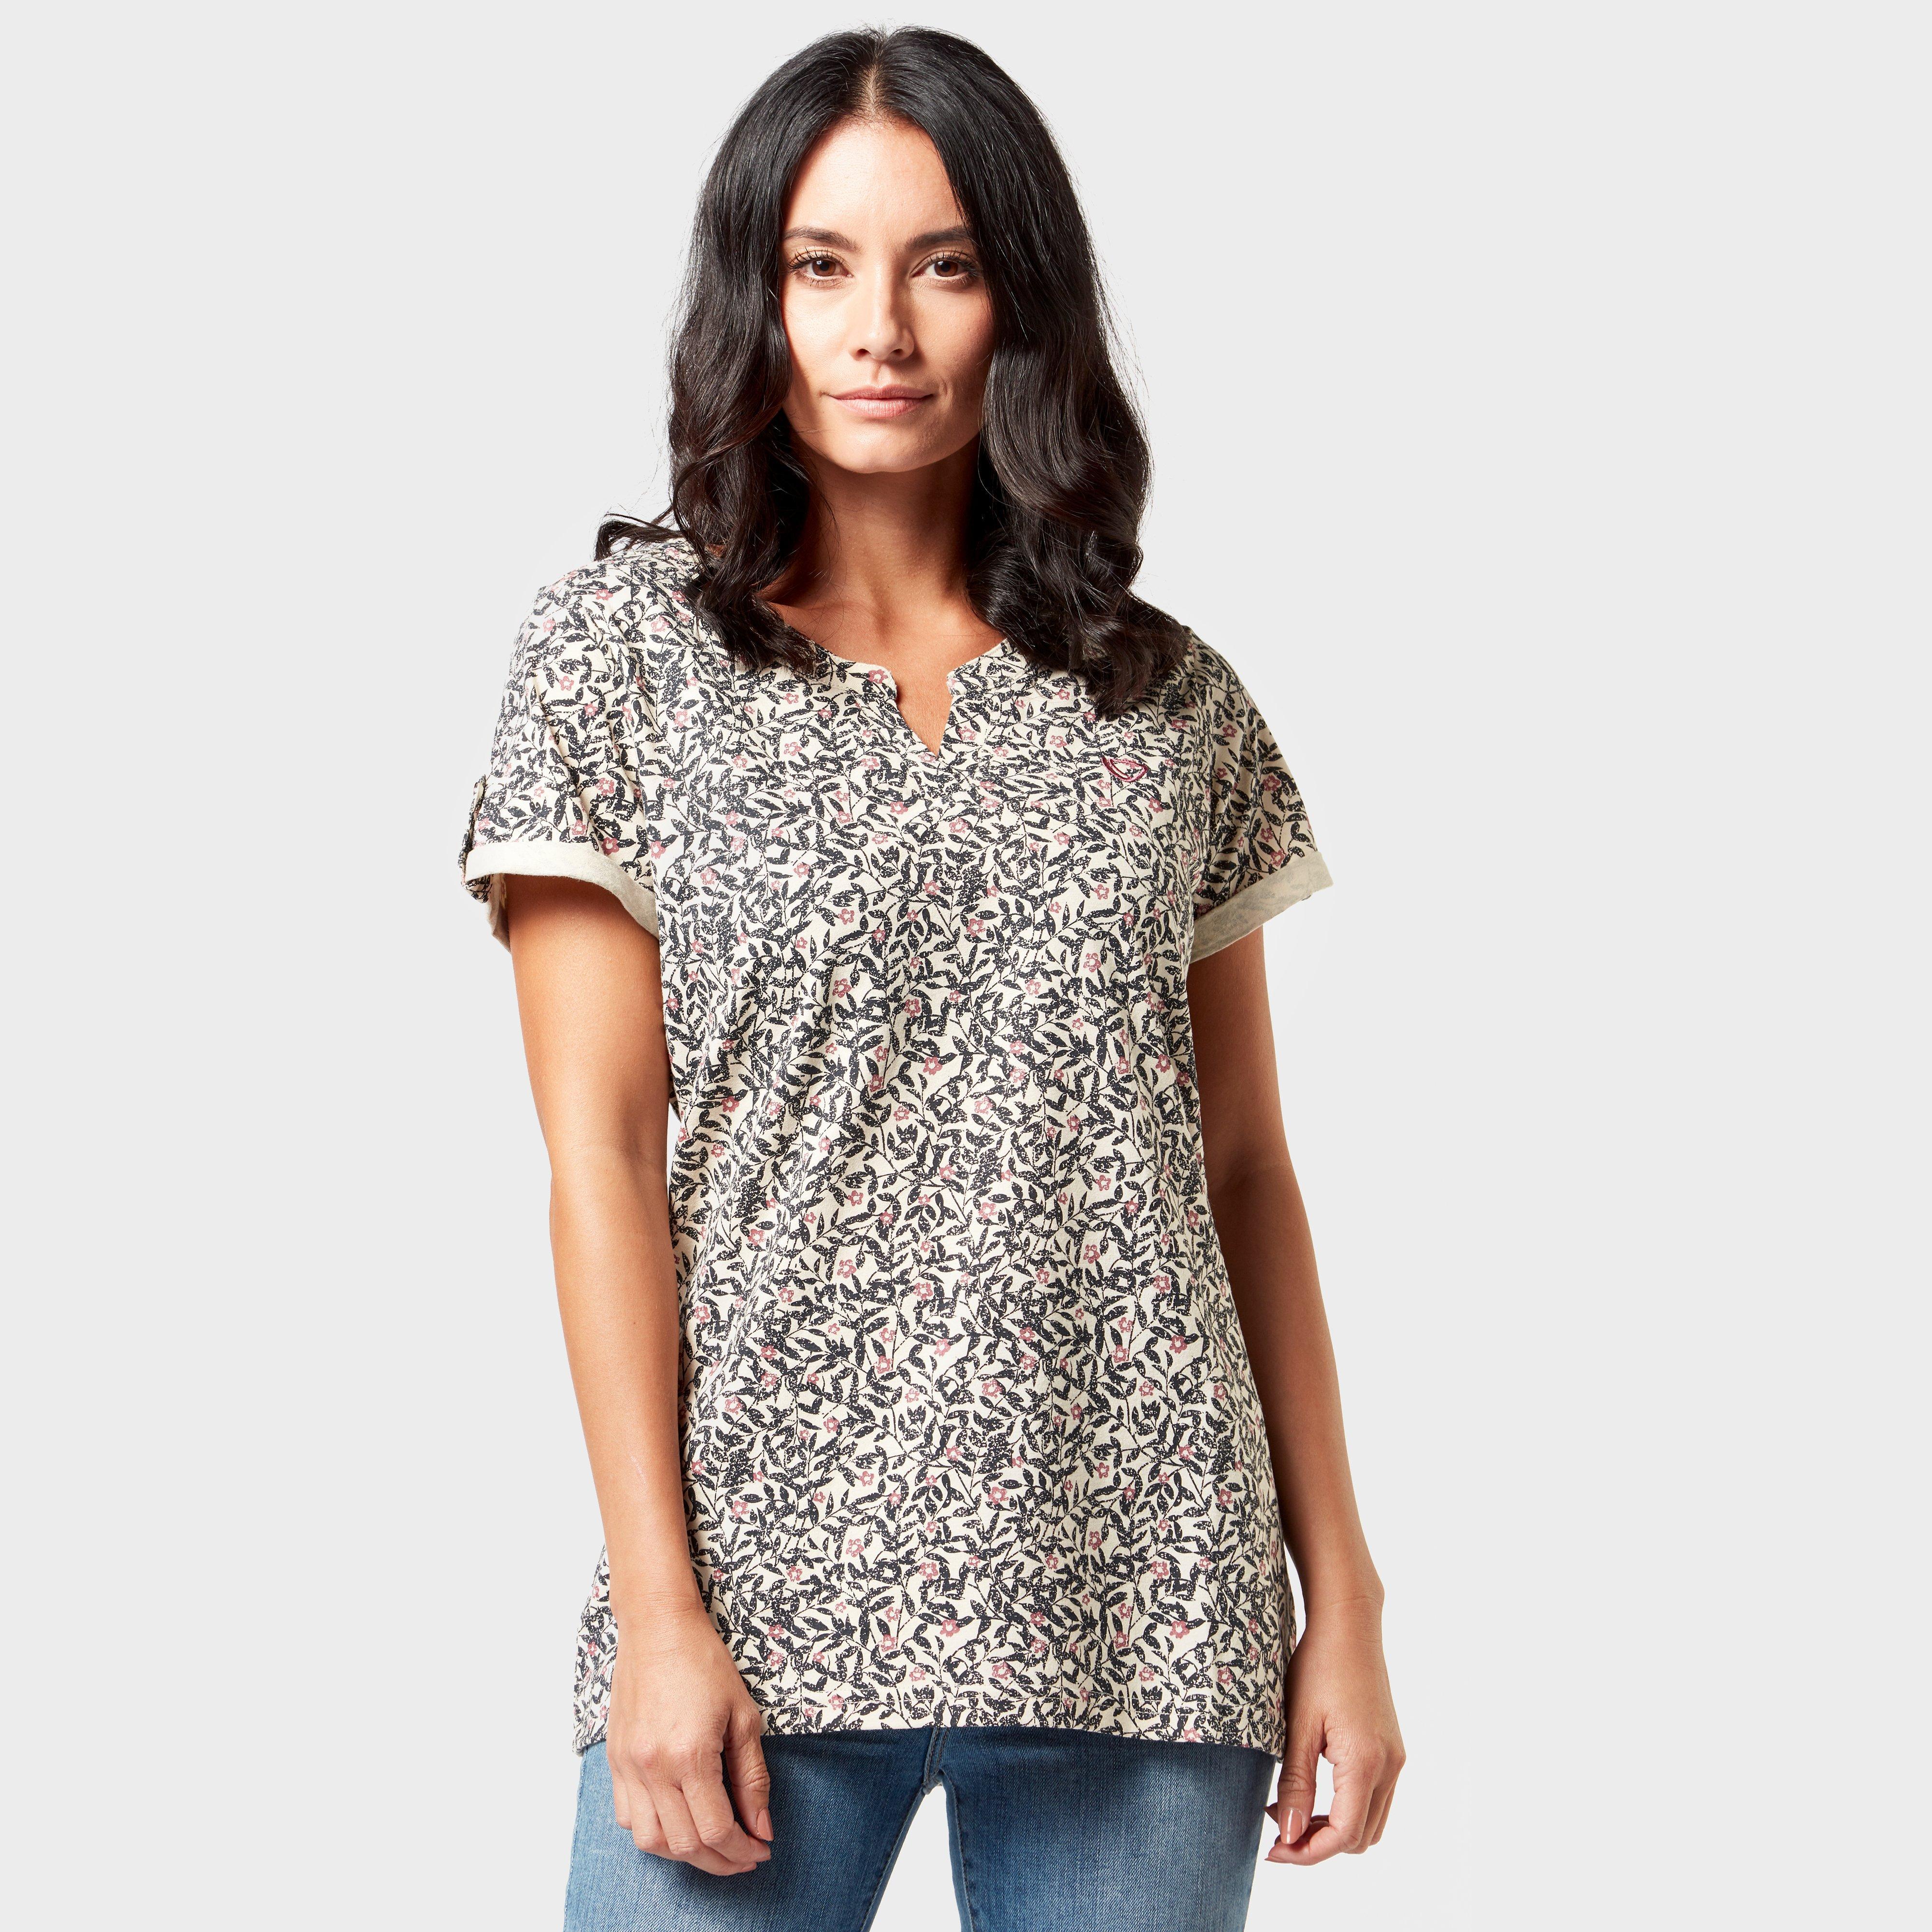 Brasher Womens Aop Print T-shirt - Multi/nvy  Multi/nvy